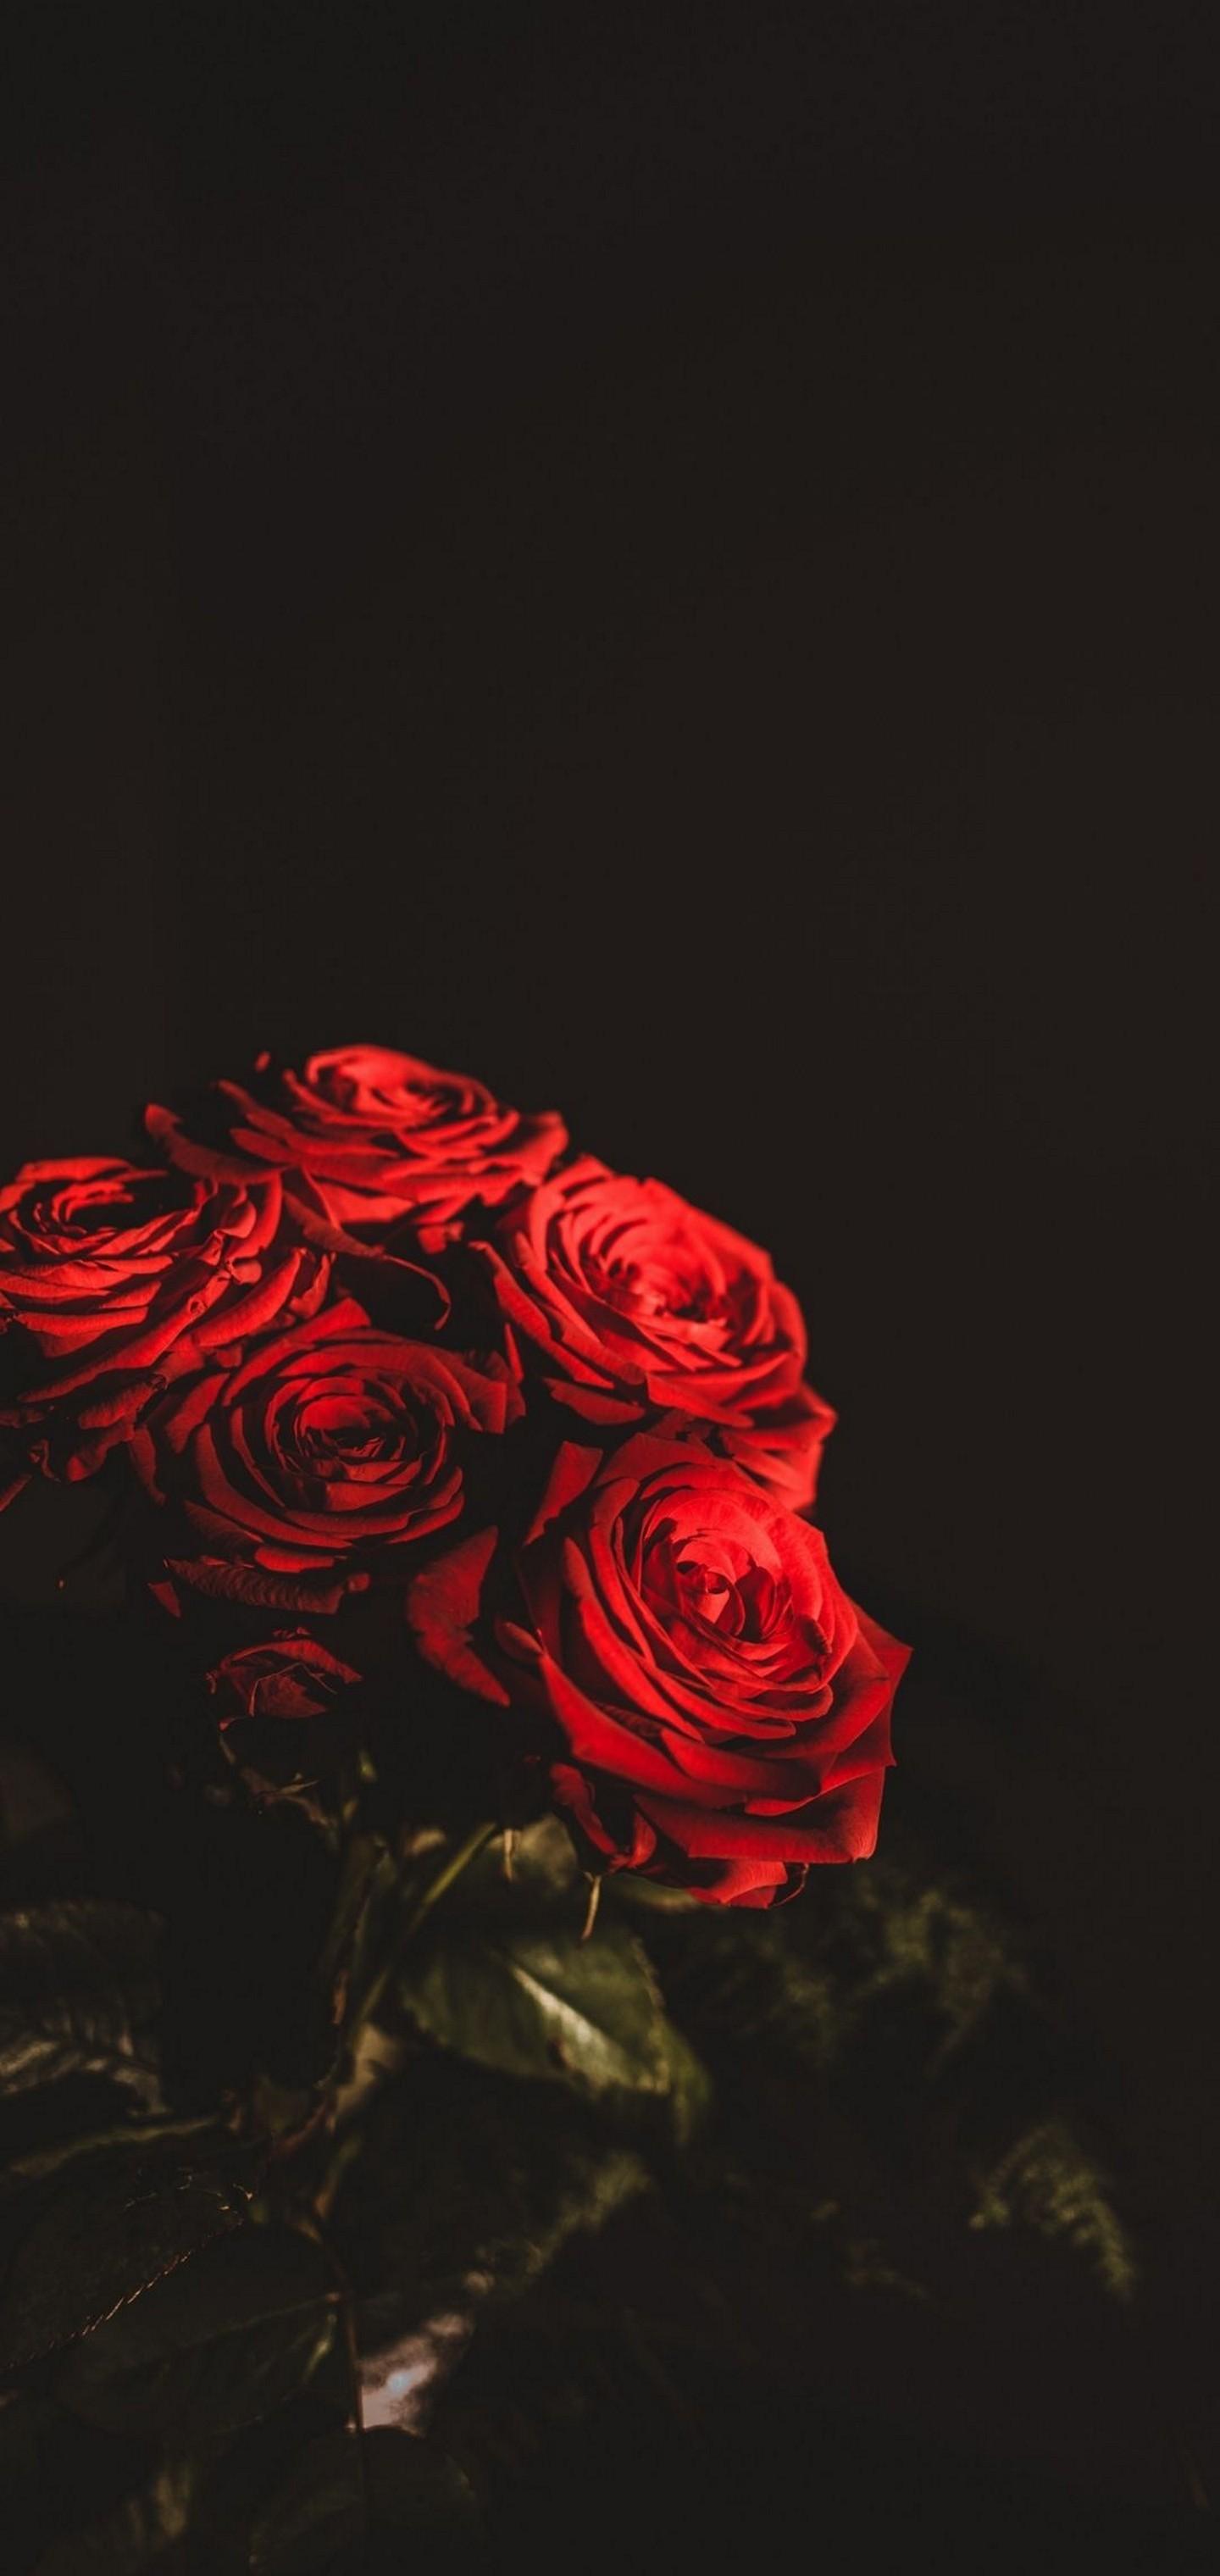 Res: 1440x3040, Dark Red Flowers Bouquet Wallpaper  768x1621